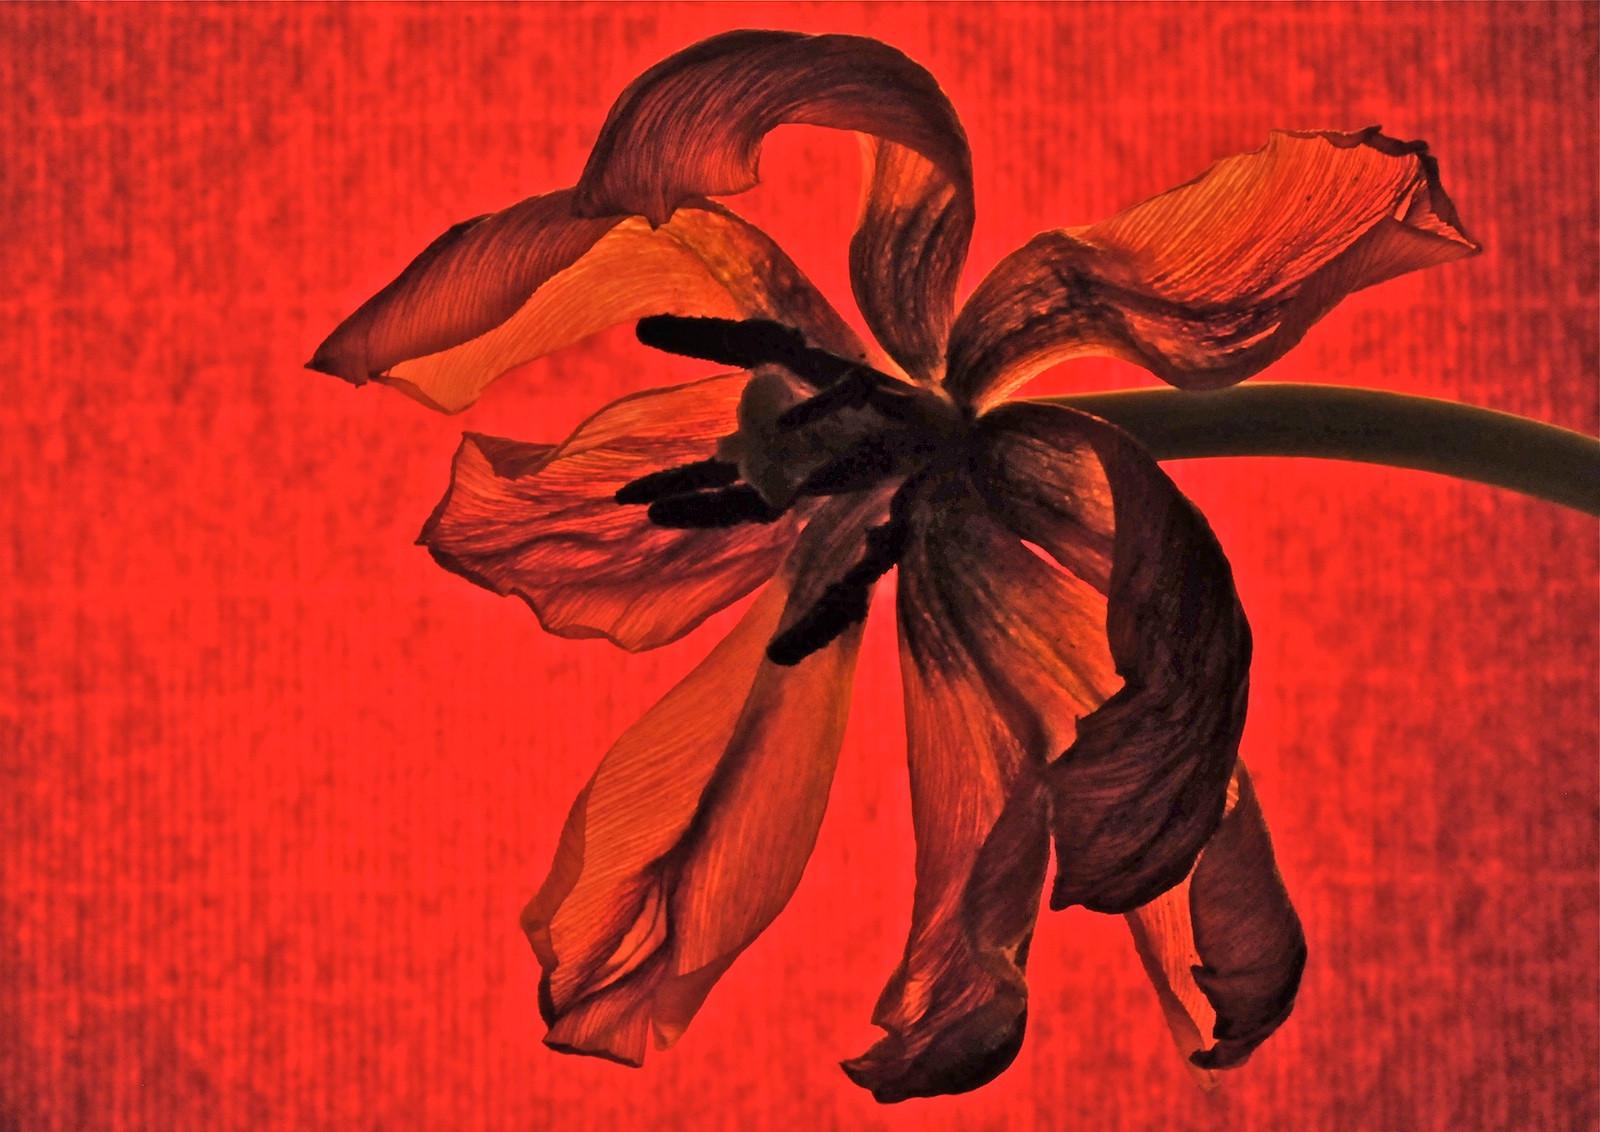 COLOUR - RedDeadHead by Geoff Sloan (10 marks)